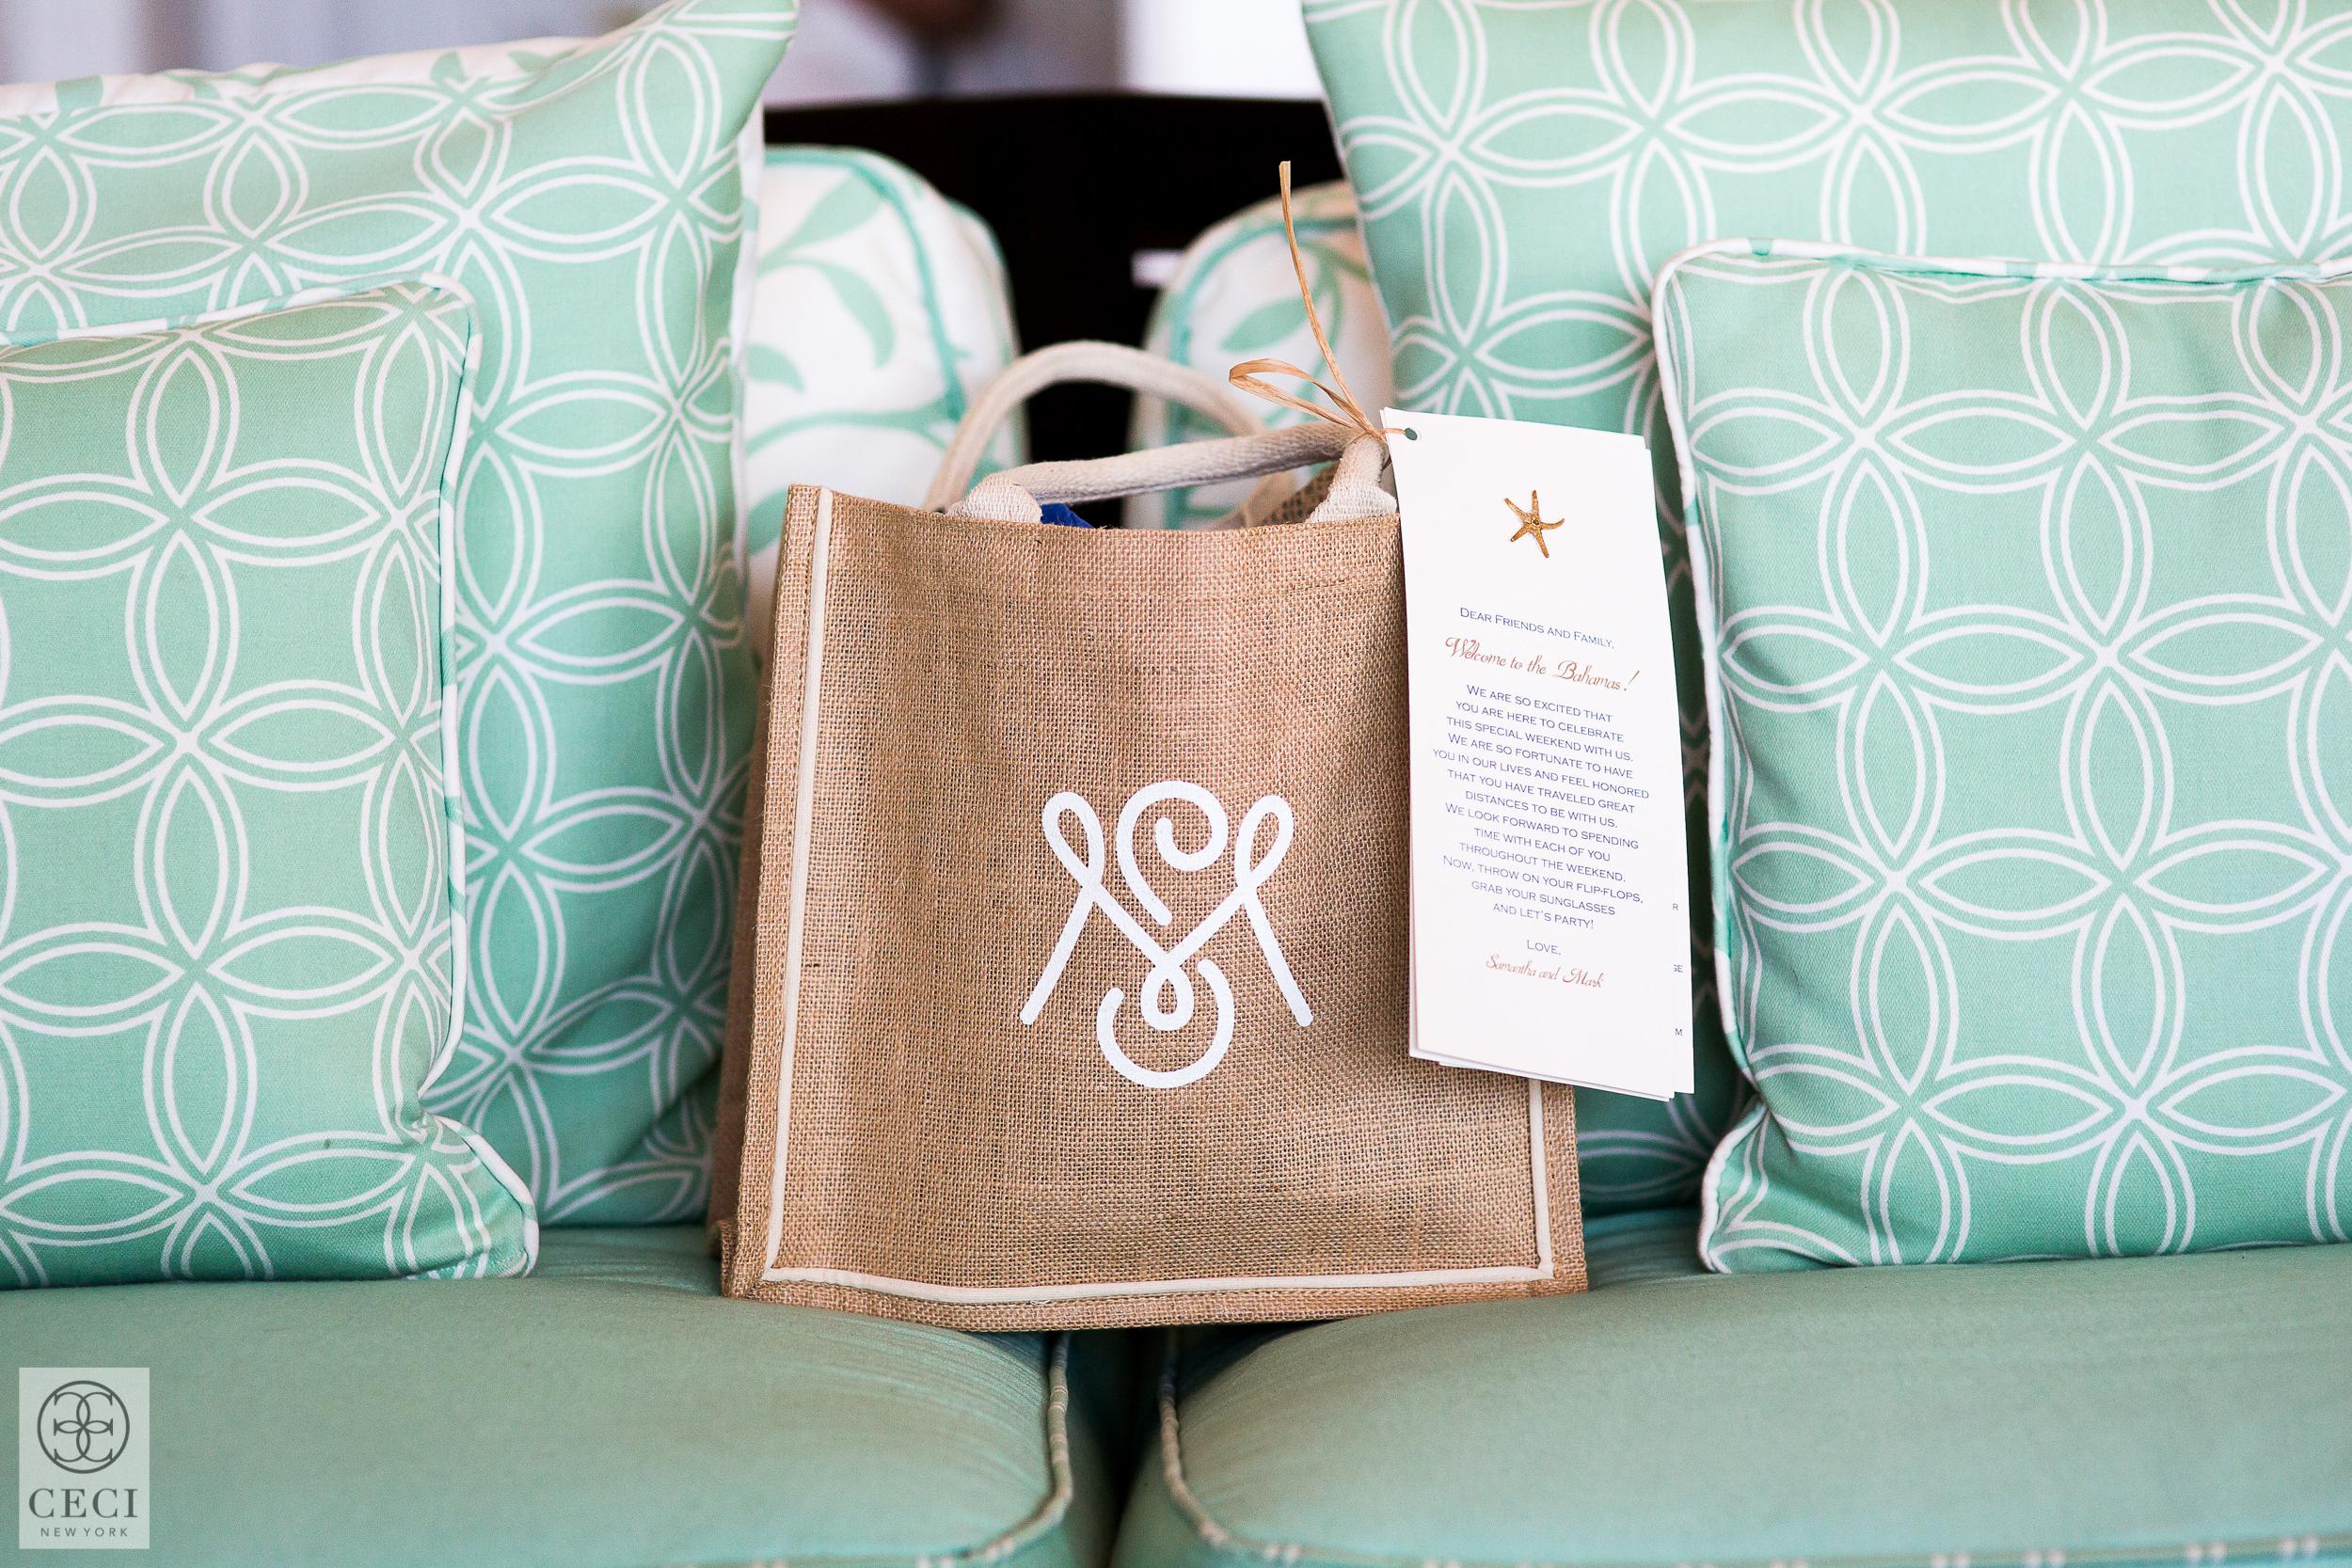 Ceci_New_York_Ceci_Style_Ceci_Johnson_Luxury_Lifestyle_Paradise_Island_Bahamas_Wedding_Engraved_Inspiration_Design_Custom_Couture_Personalized_Invitations_--4.jpg